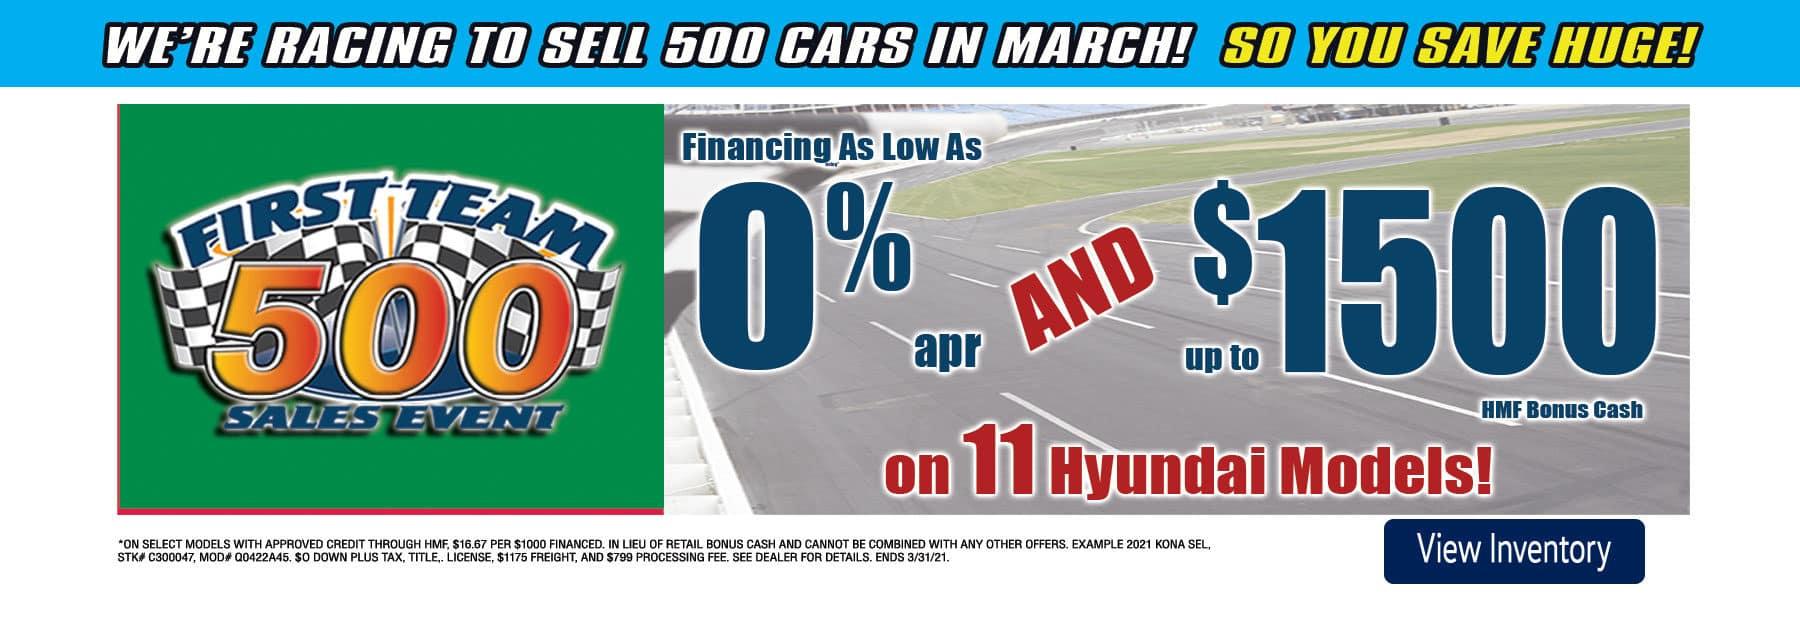 hyundai2-March-500-0%-slide